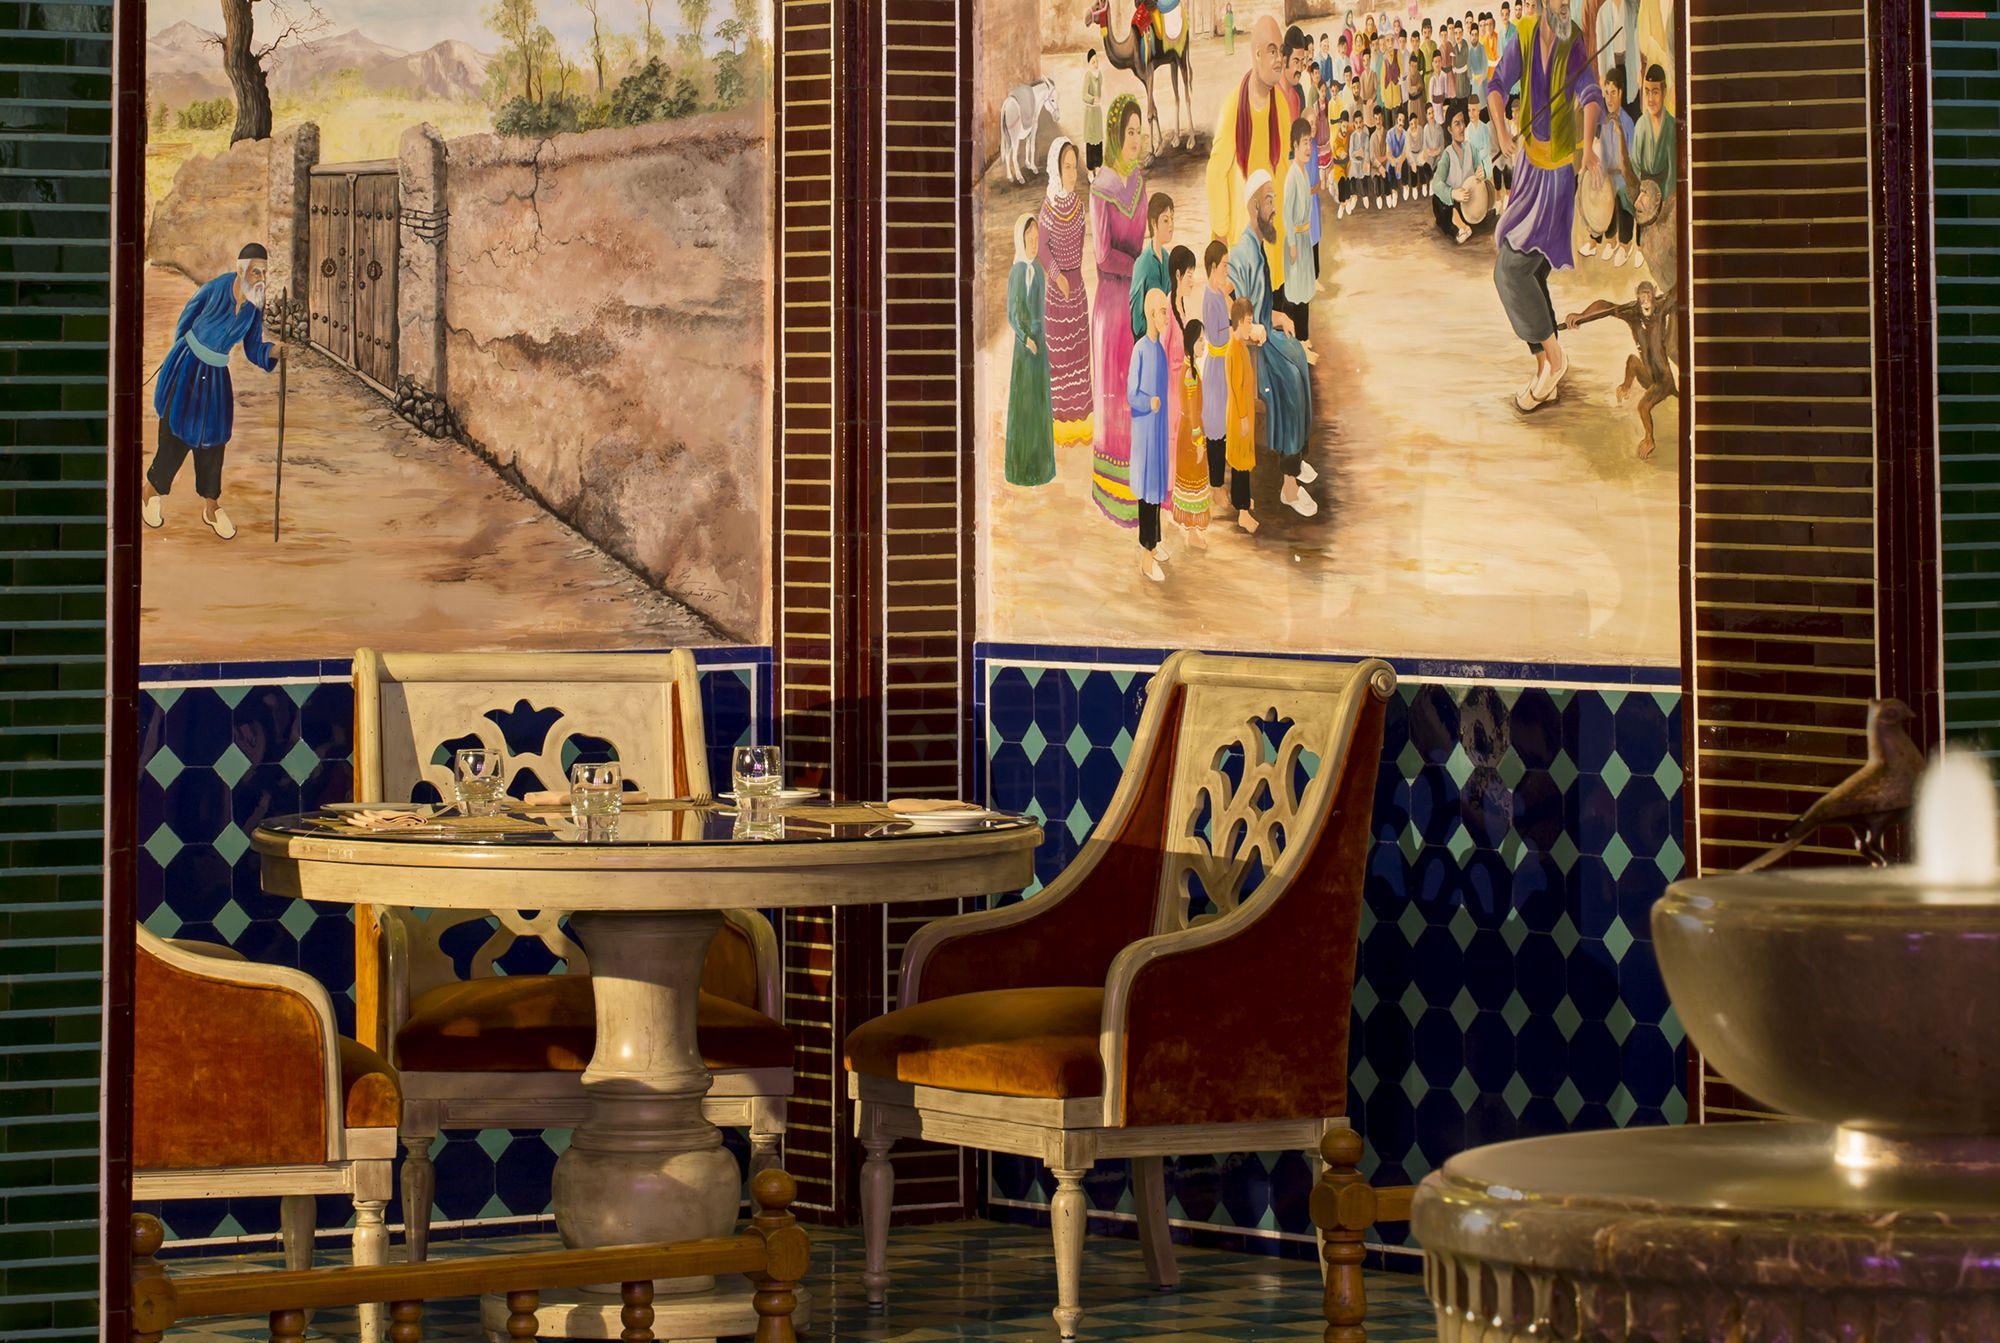 Parisa Souq Waqif | Sharq Village & Spa